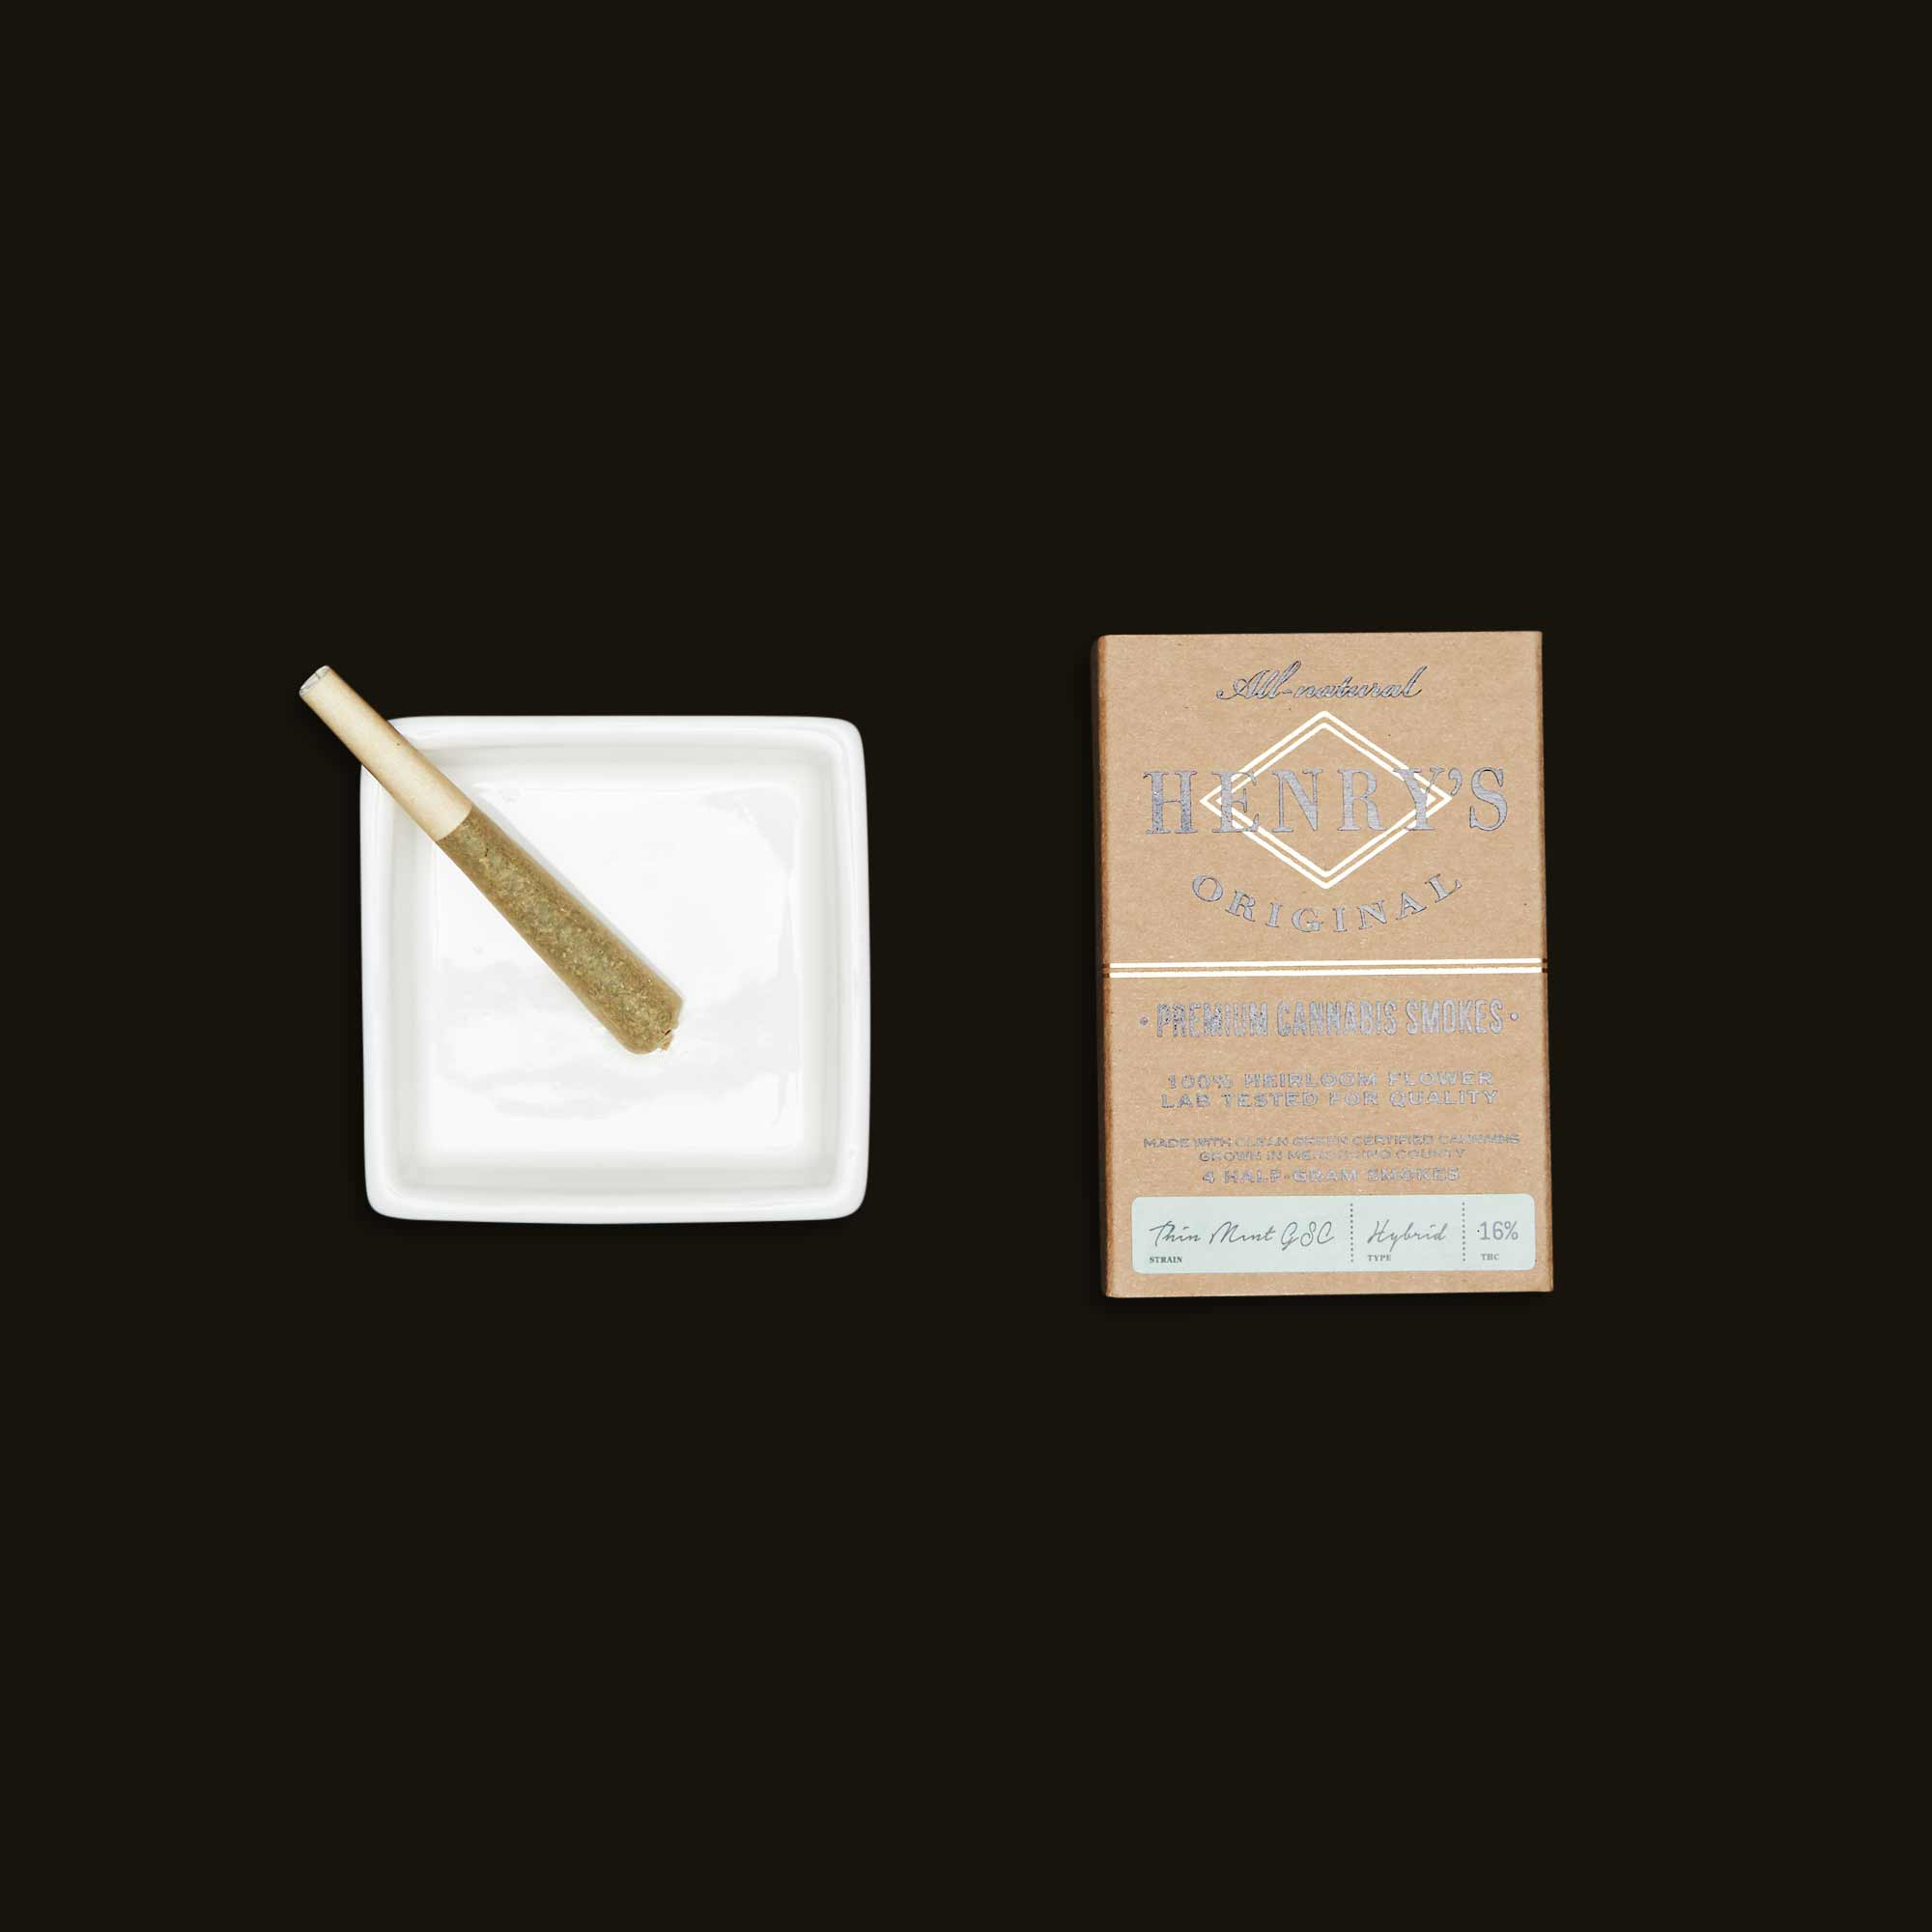 Henry's Original Thin Mint GSC Premium Cannabis Smokes